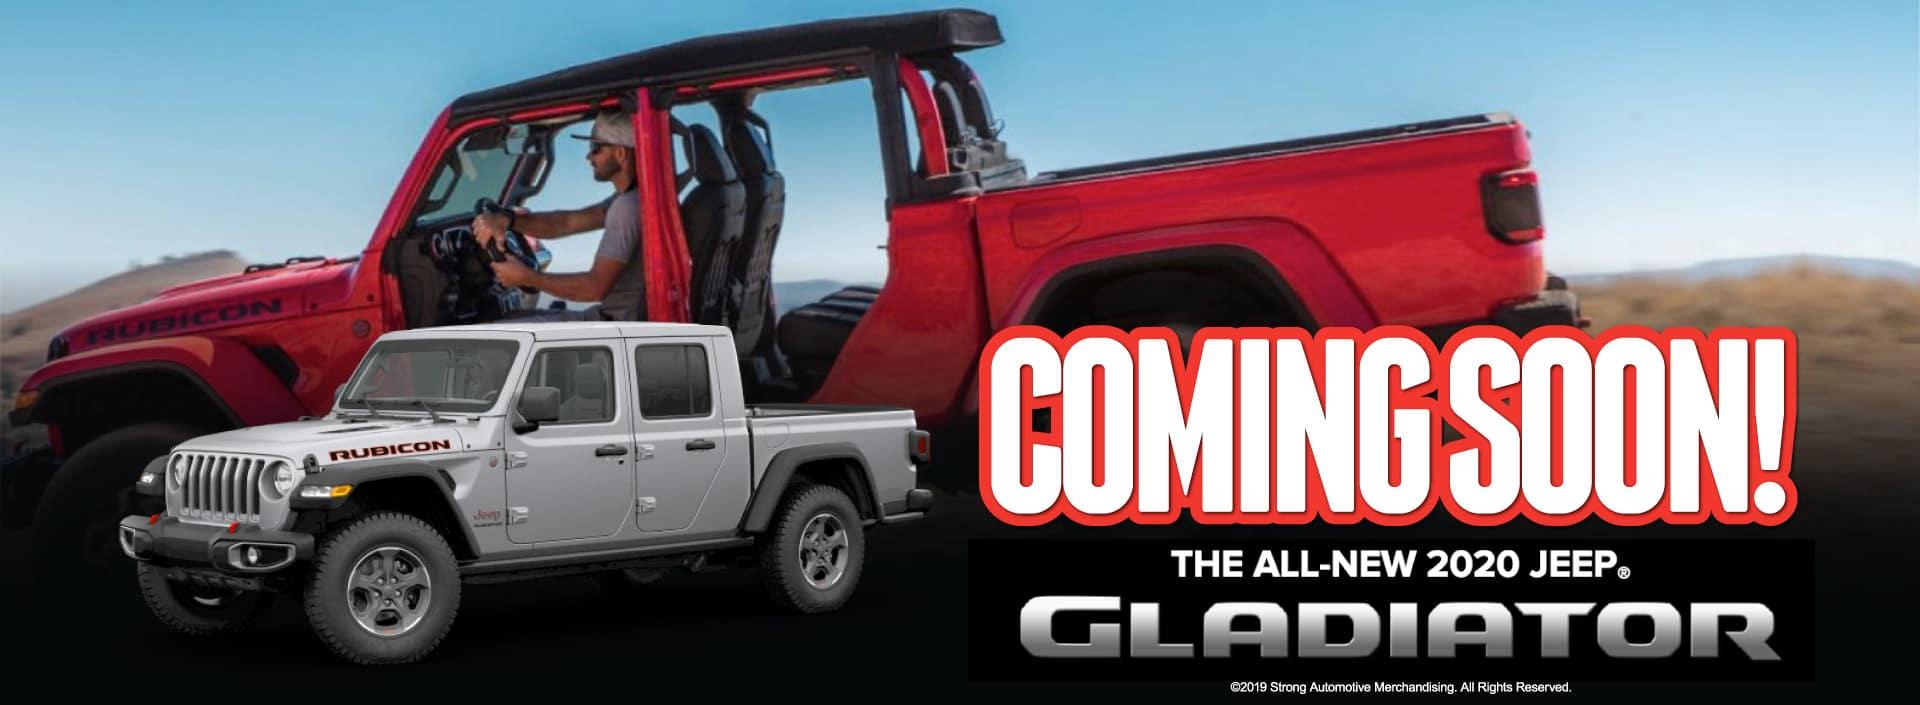 jeep gladiator - coming soon